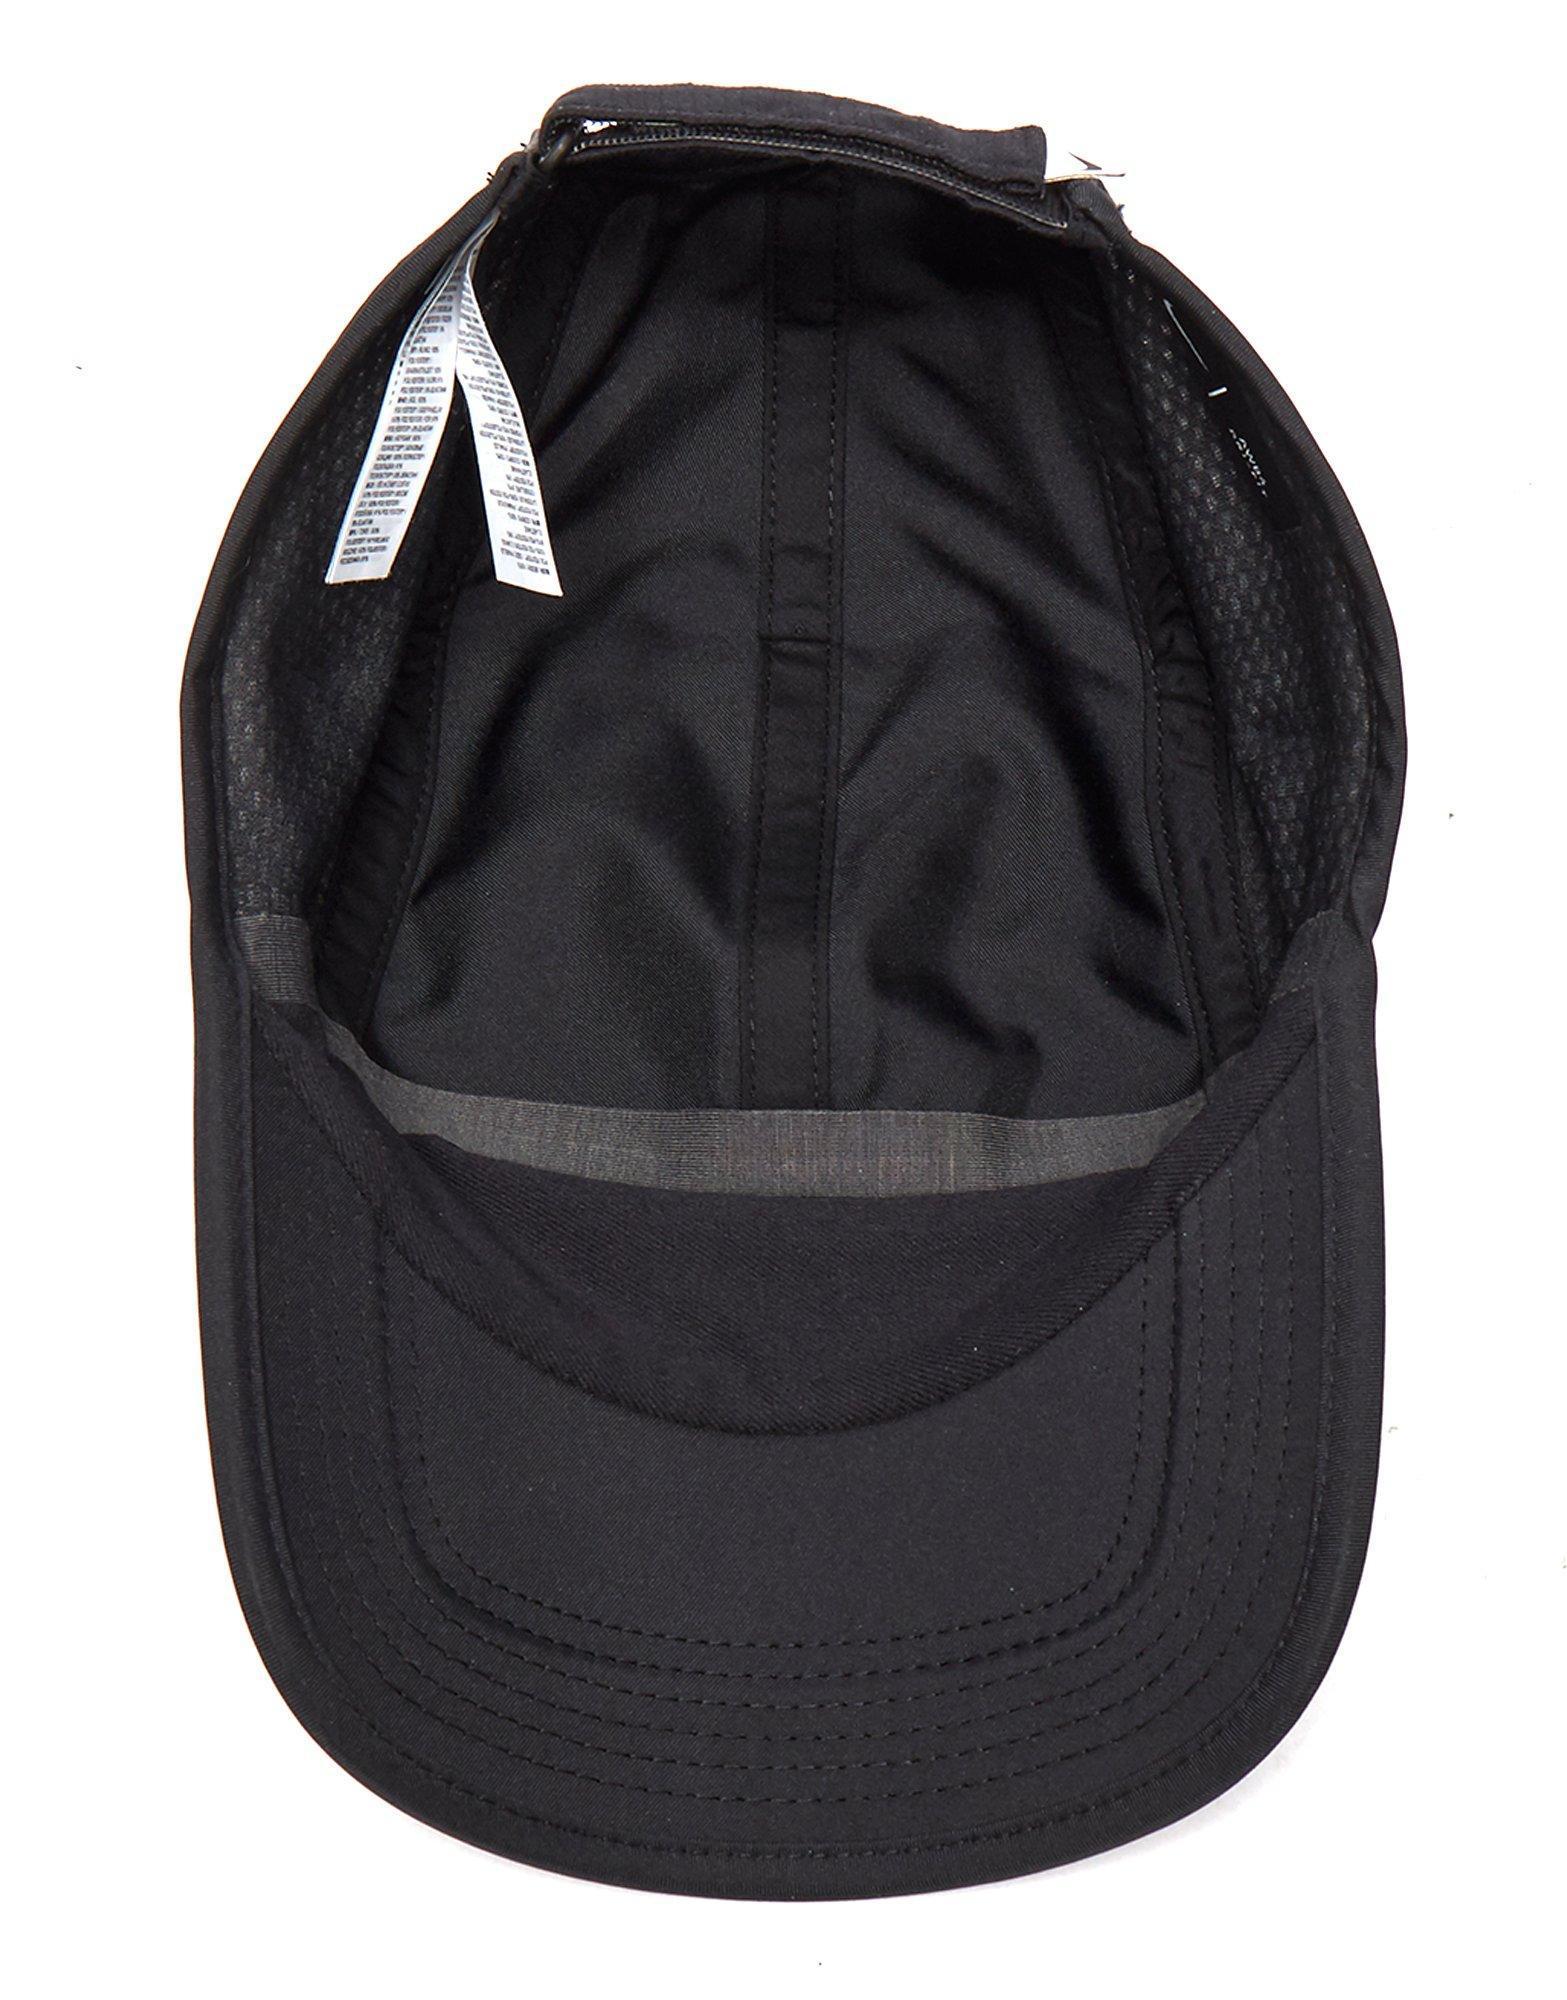 25b6ce0addc ... free shipping lyst nike run swoosh curved peak cap in black for men  26bf2 9ba11